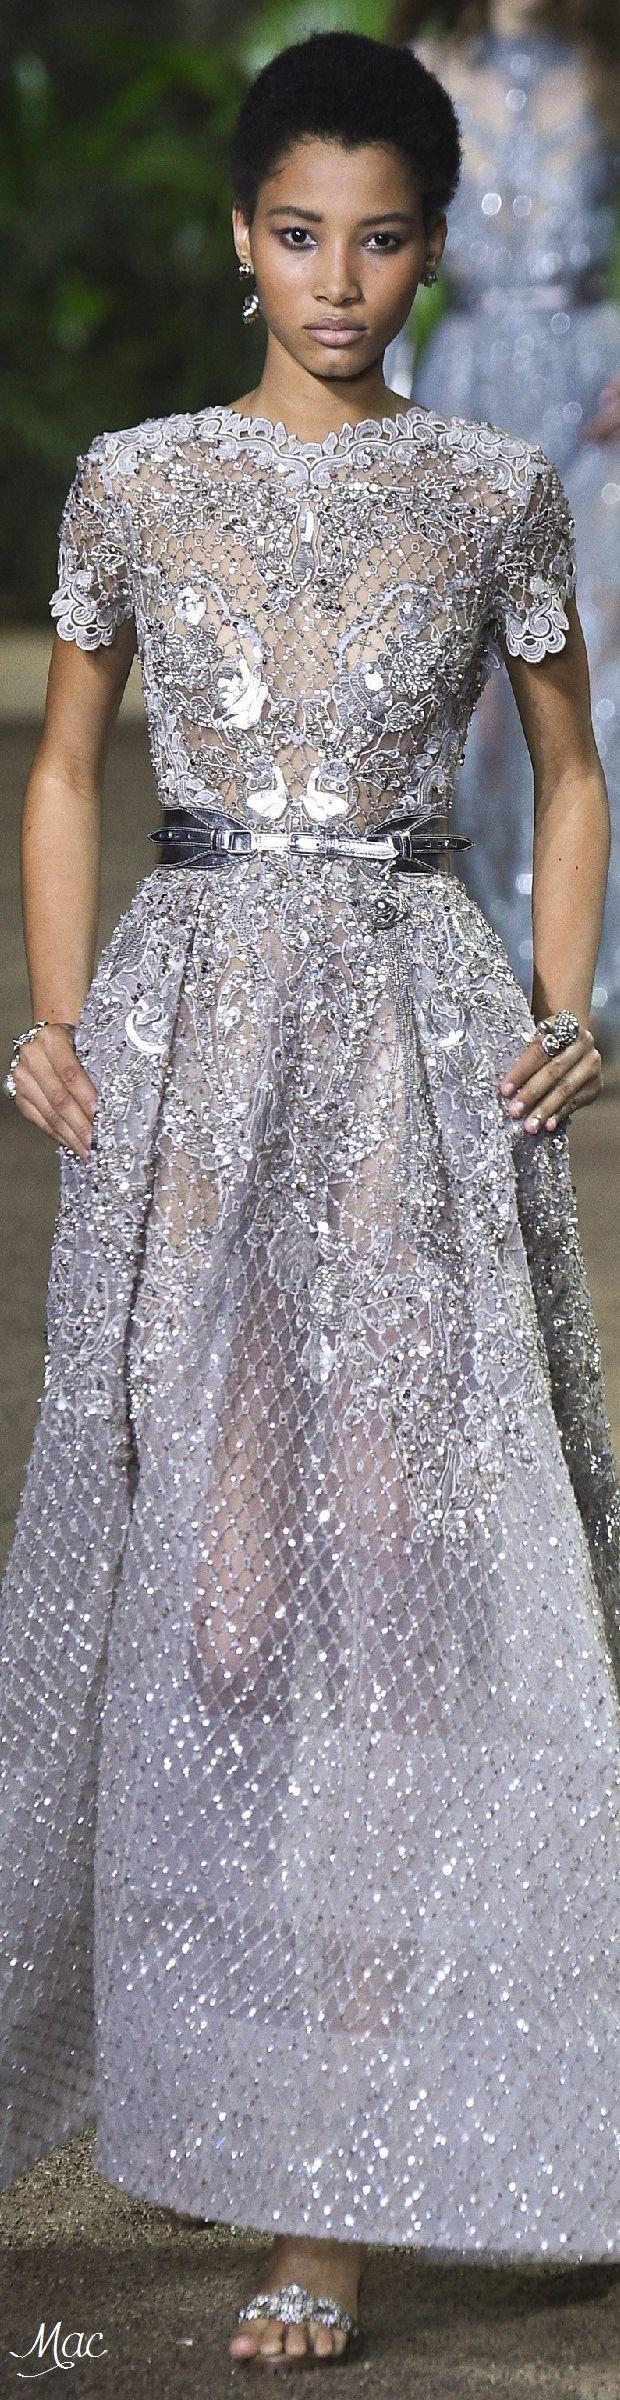 Prom dress ideas 2017 december